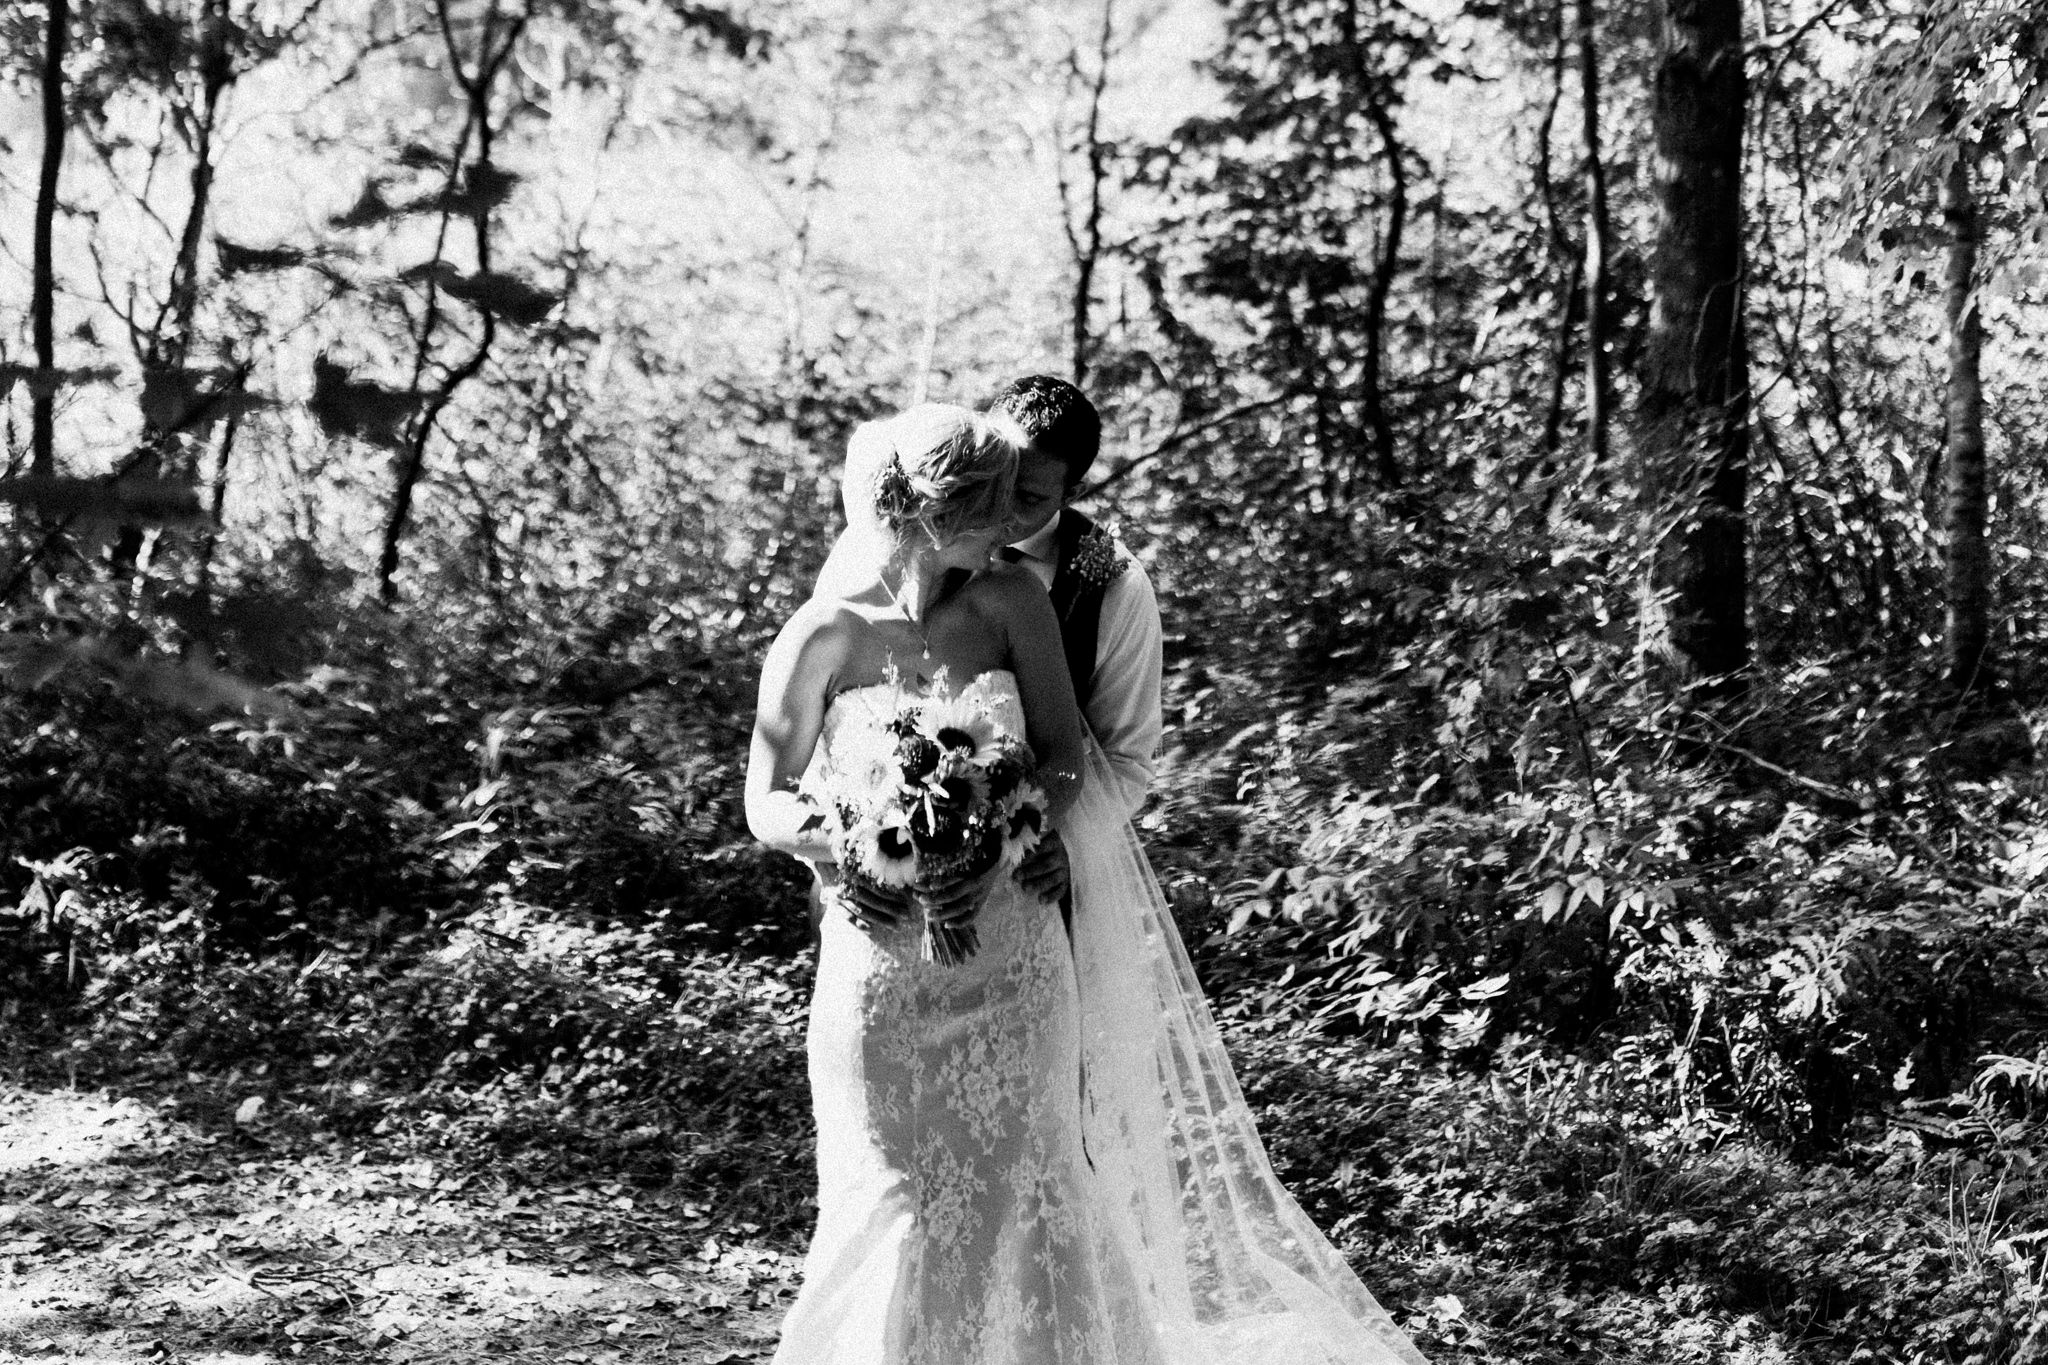 Muskoka rustic farm wedding at Brookland Farm by Max Wong Photo (29)